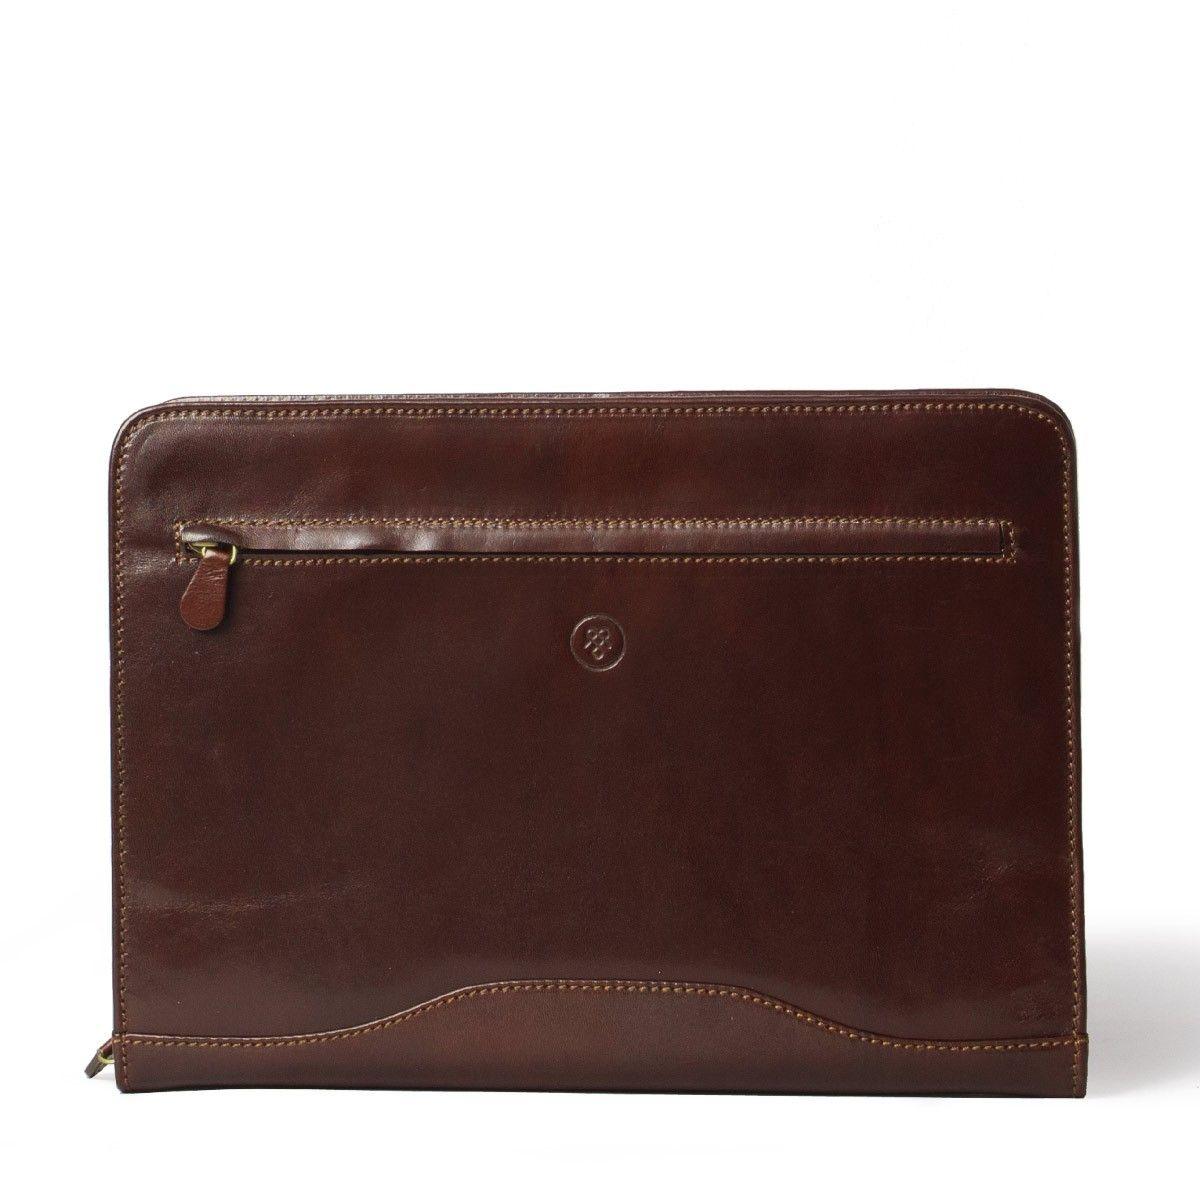 Leather Ring Folder Portfolio With Zip